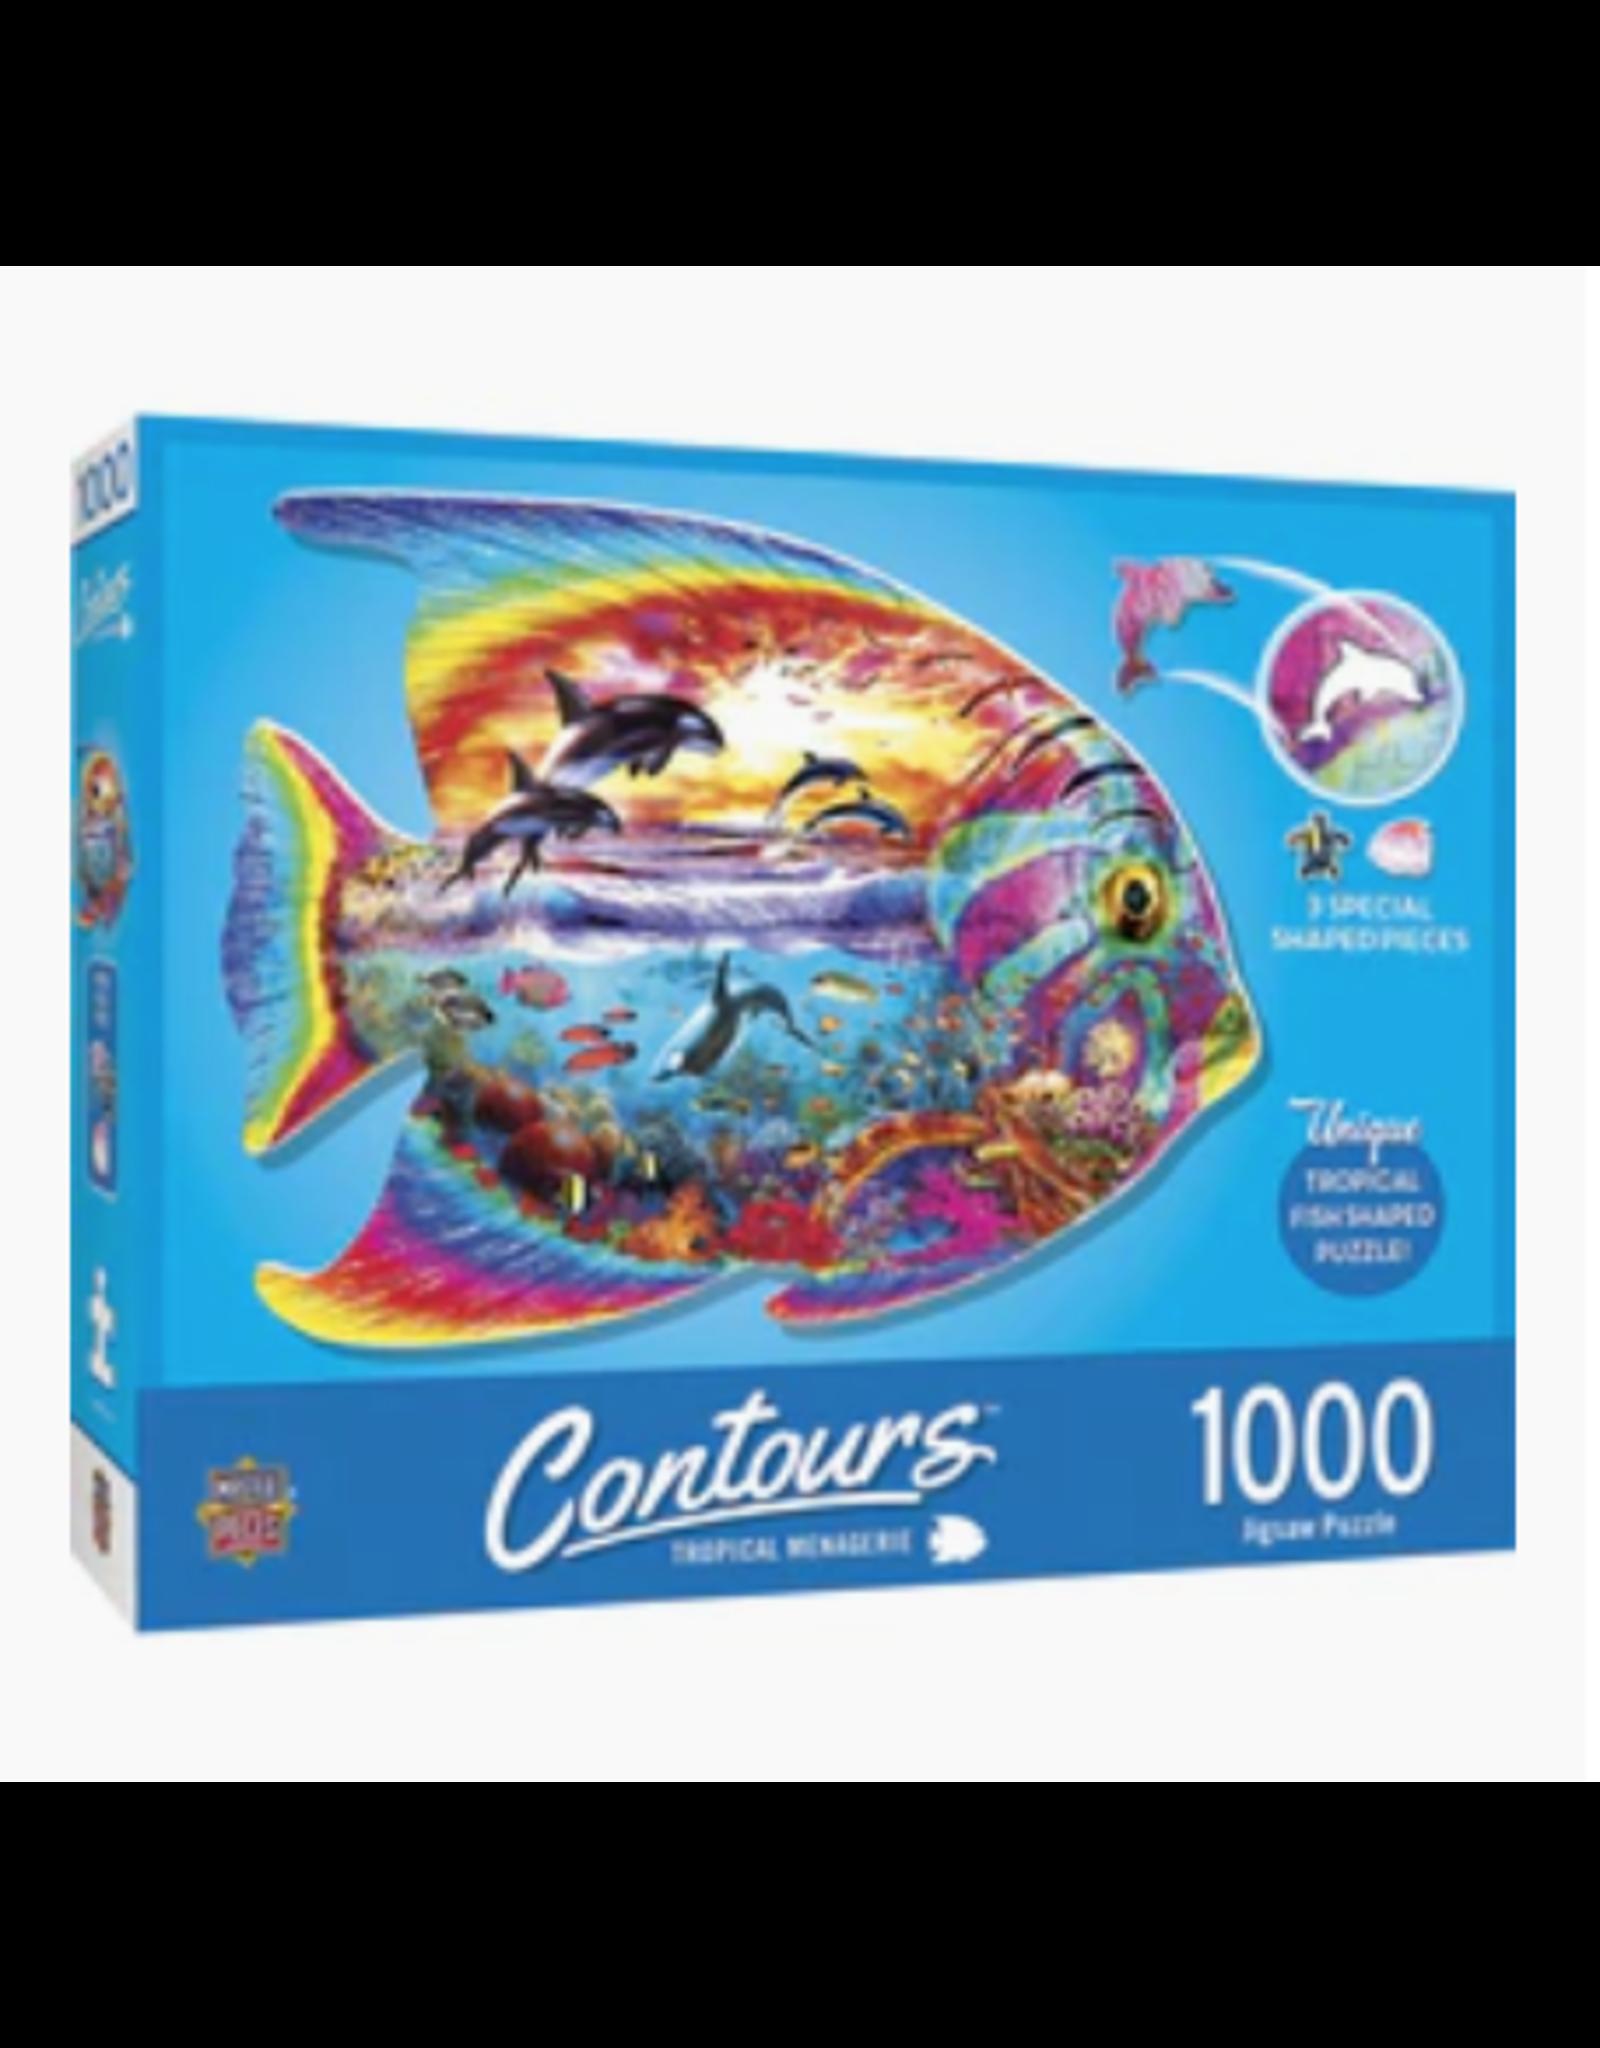 MasterPieces Countours - Tropical Fish 1000pc Shaped Puzzle